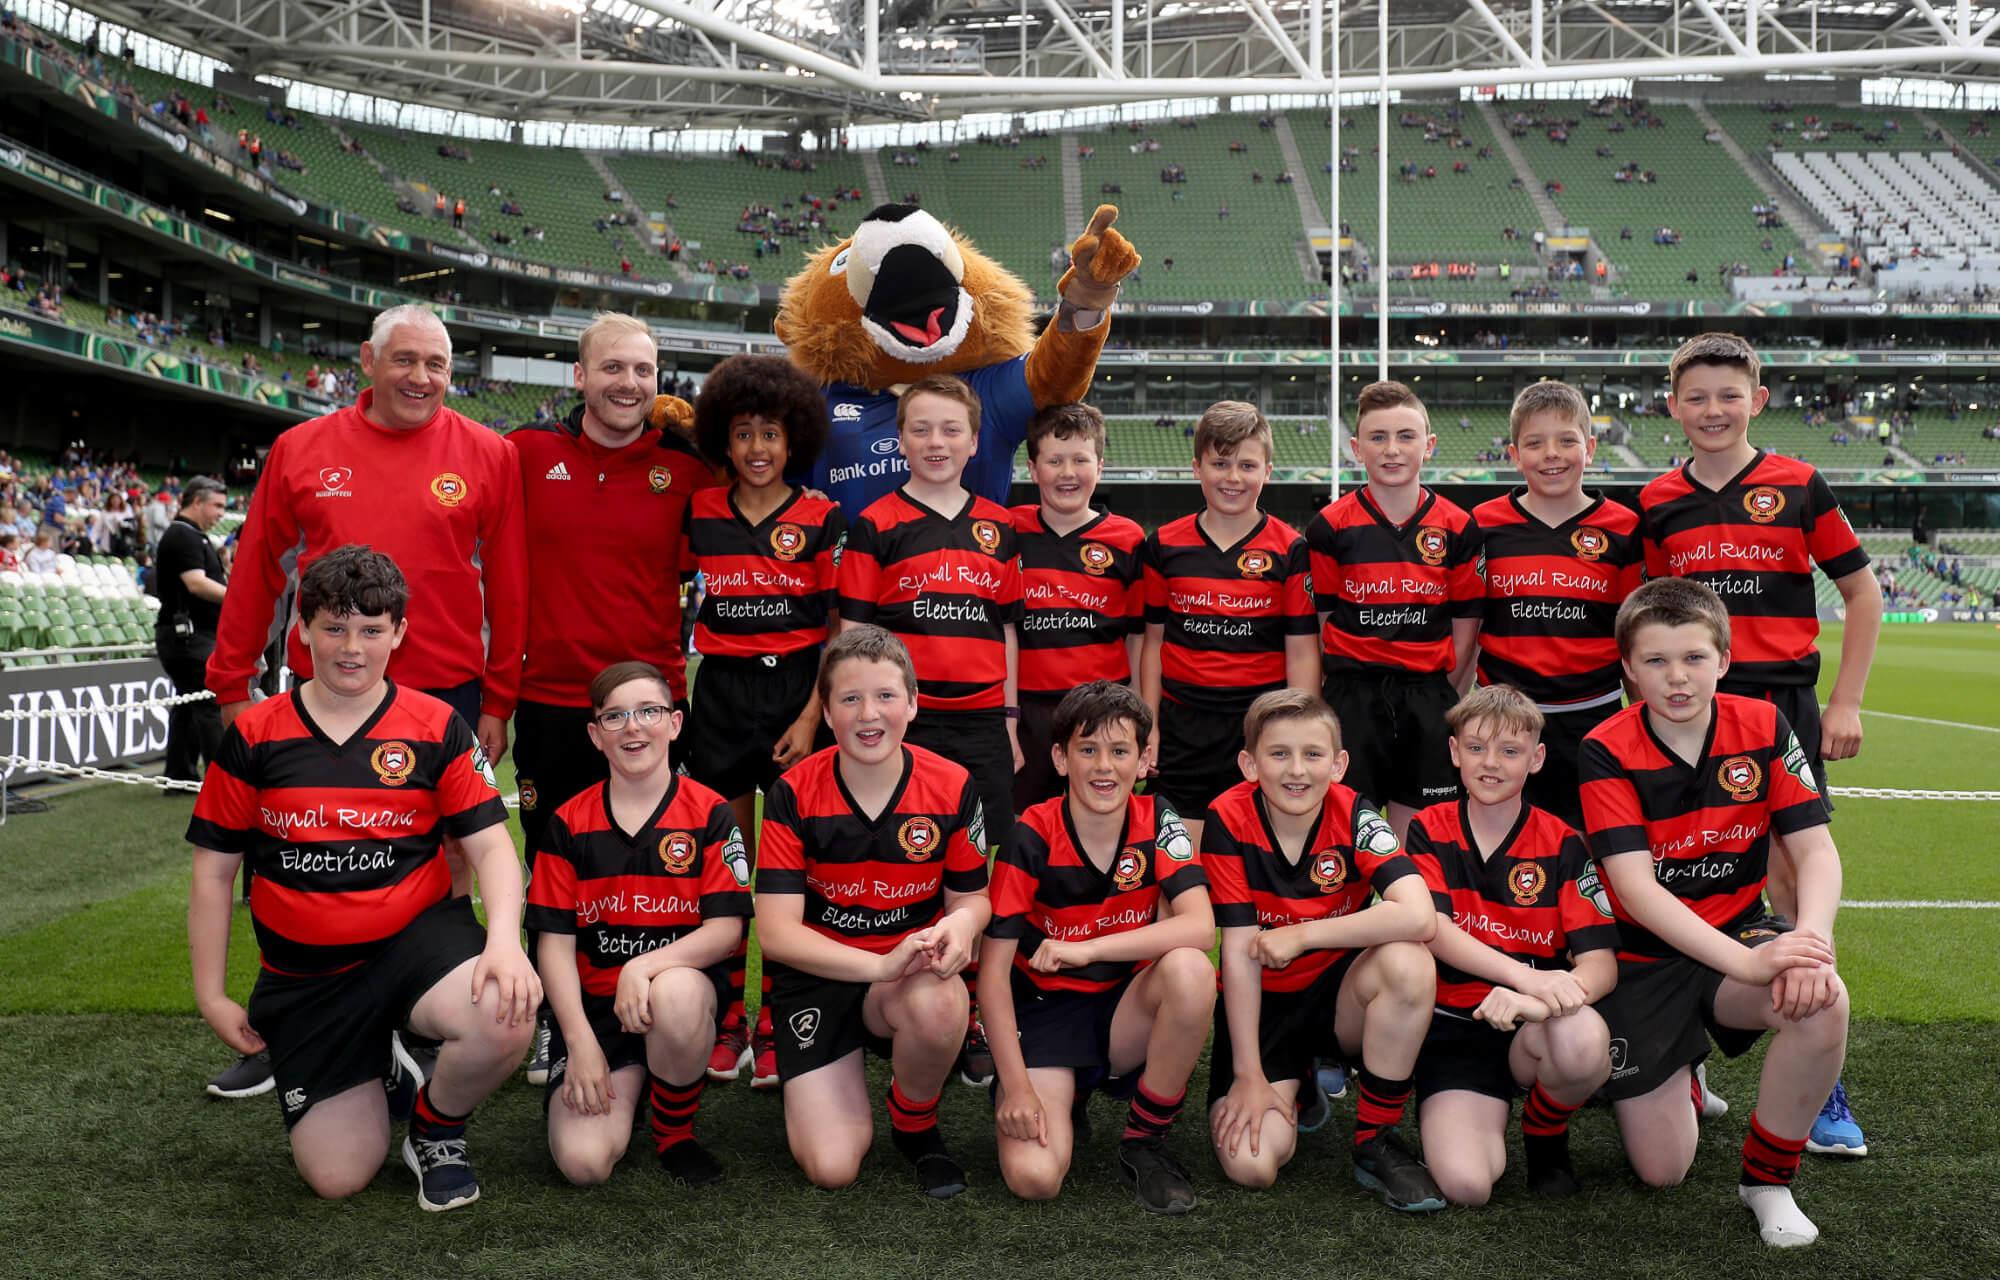 Monivea Pro14 Rugby Team at Aviva Stadium